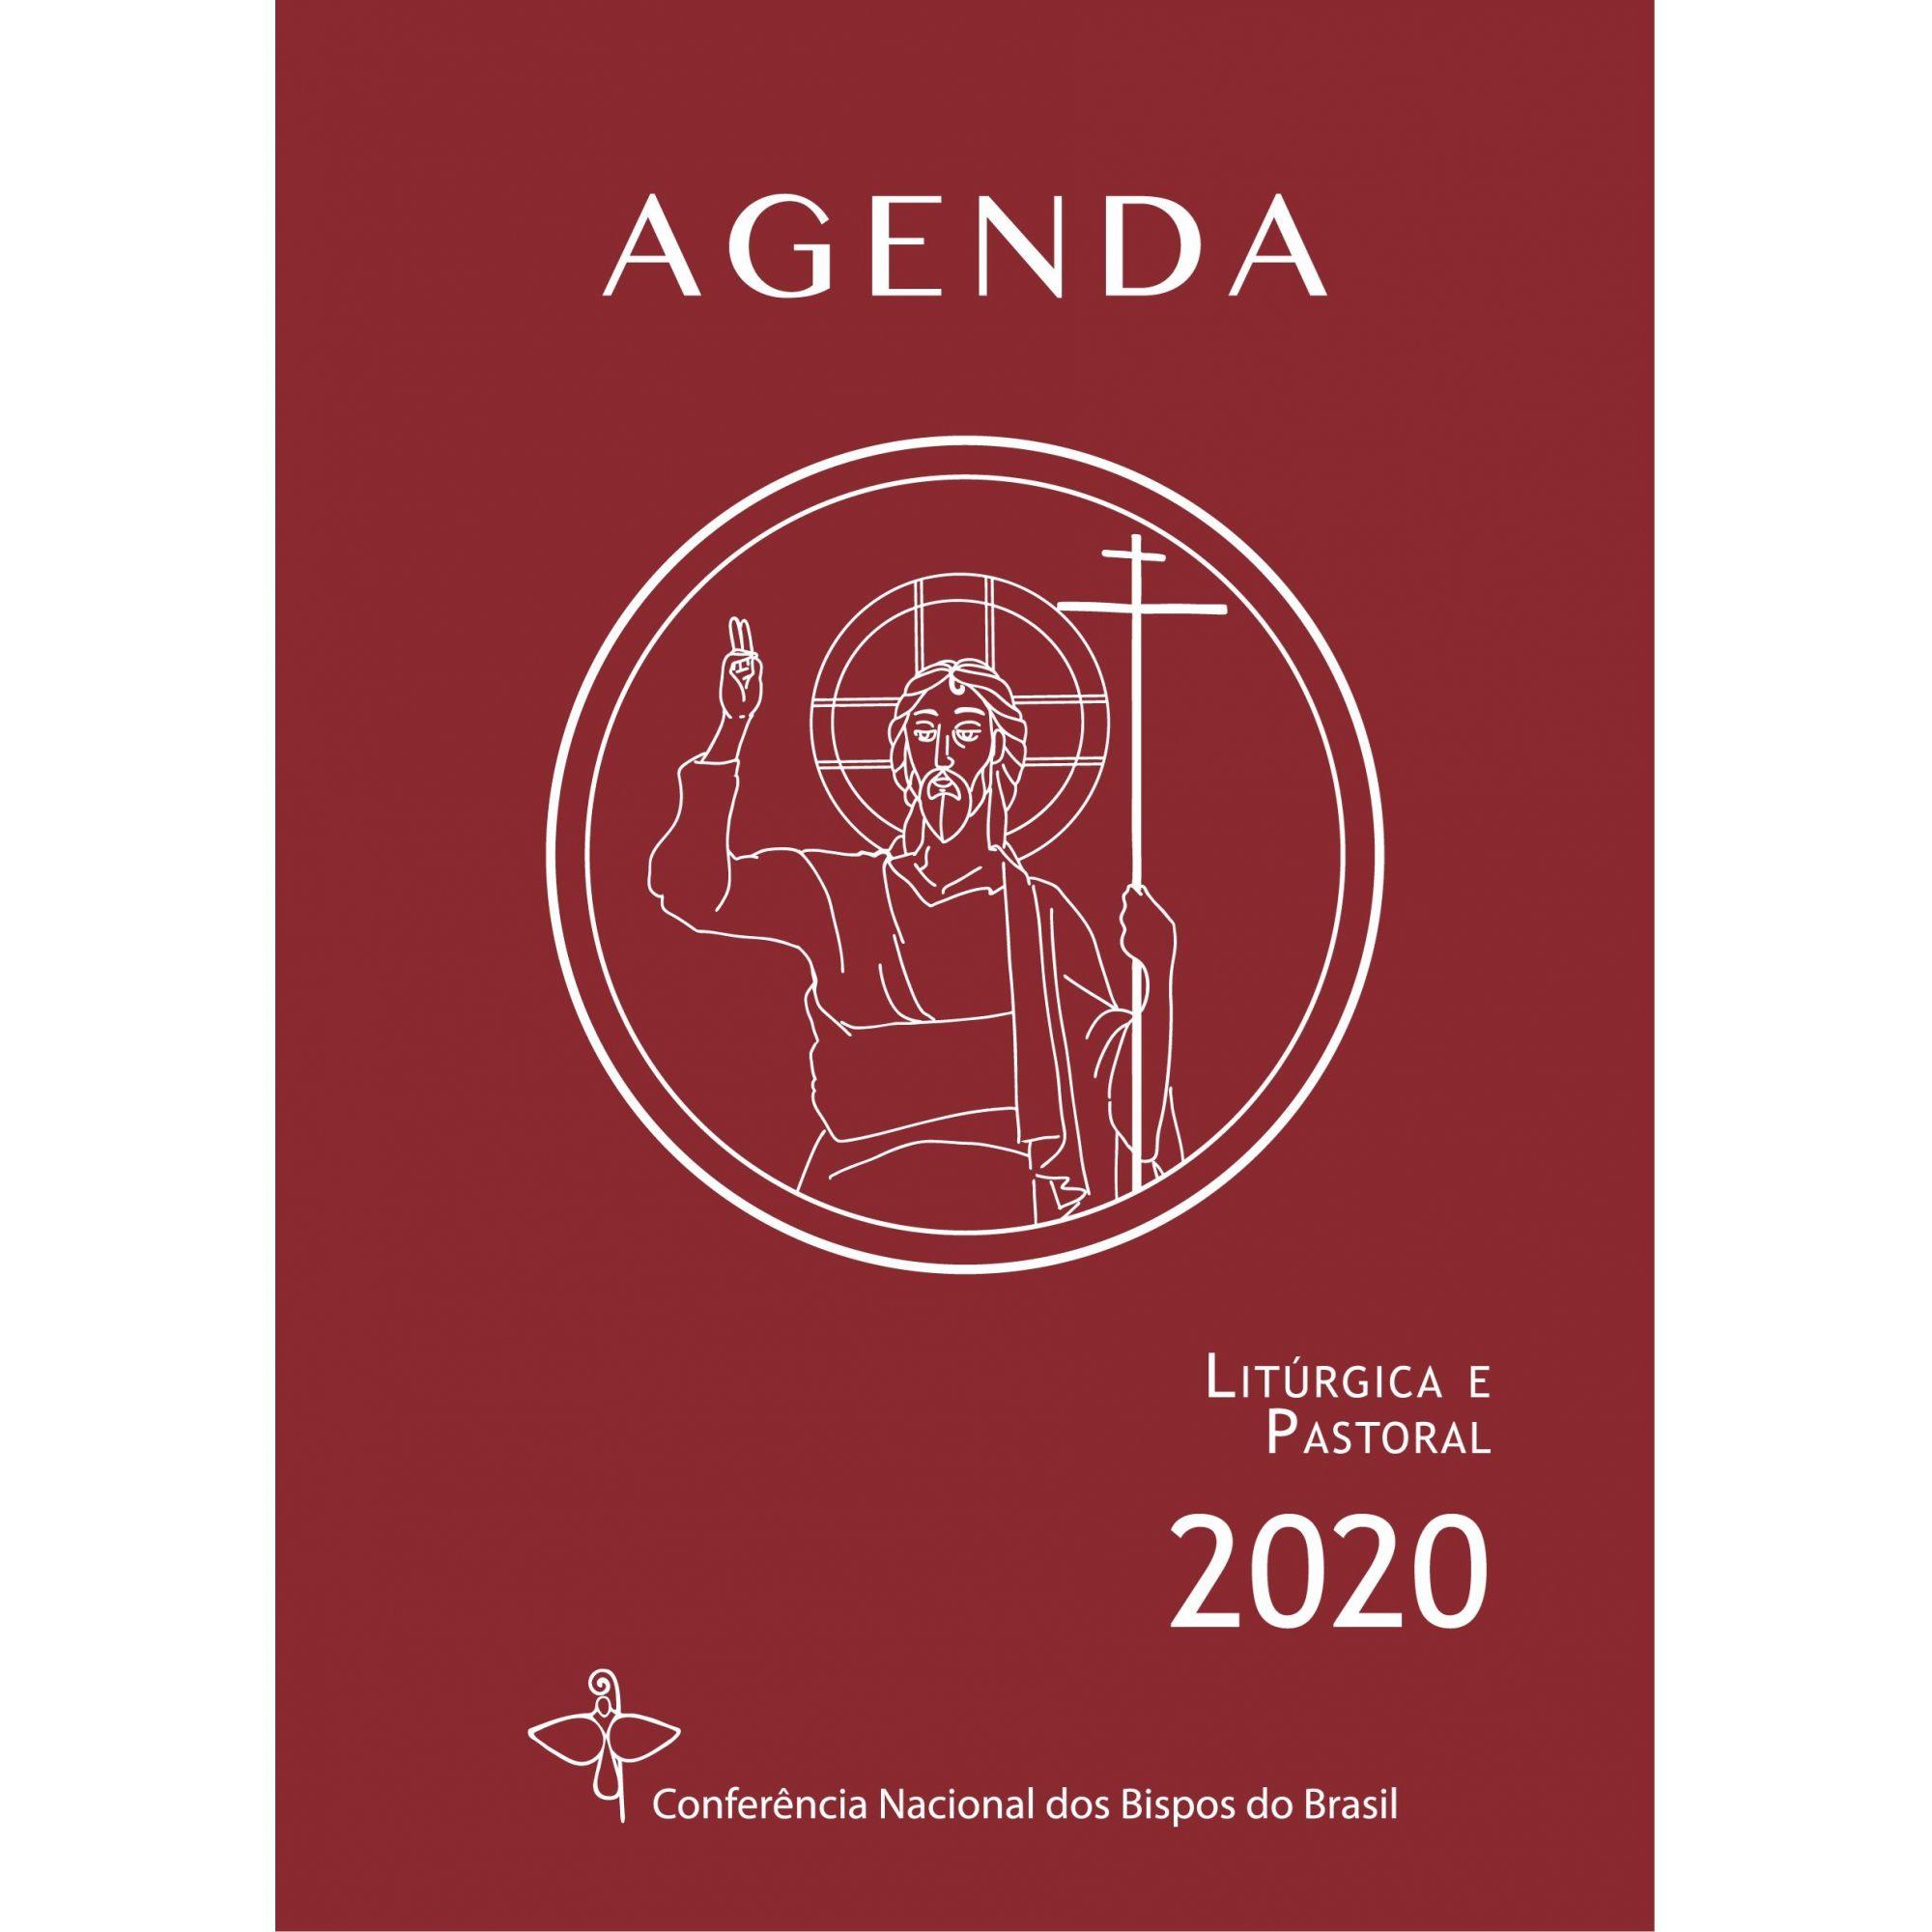 Agenda Litúrgica e Pastoral 2020 - Capa Cristal  - Pastoral Familiar CNBB